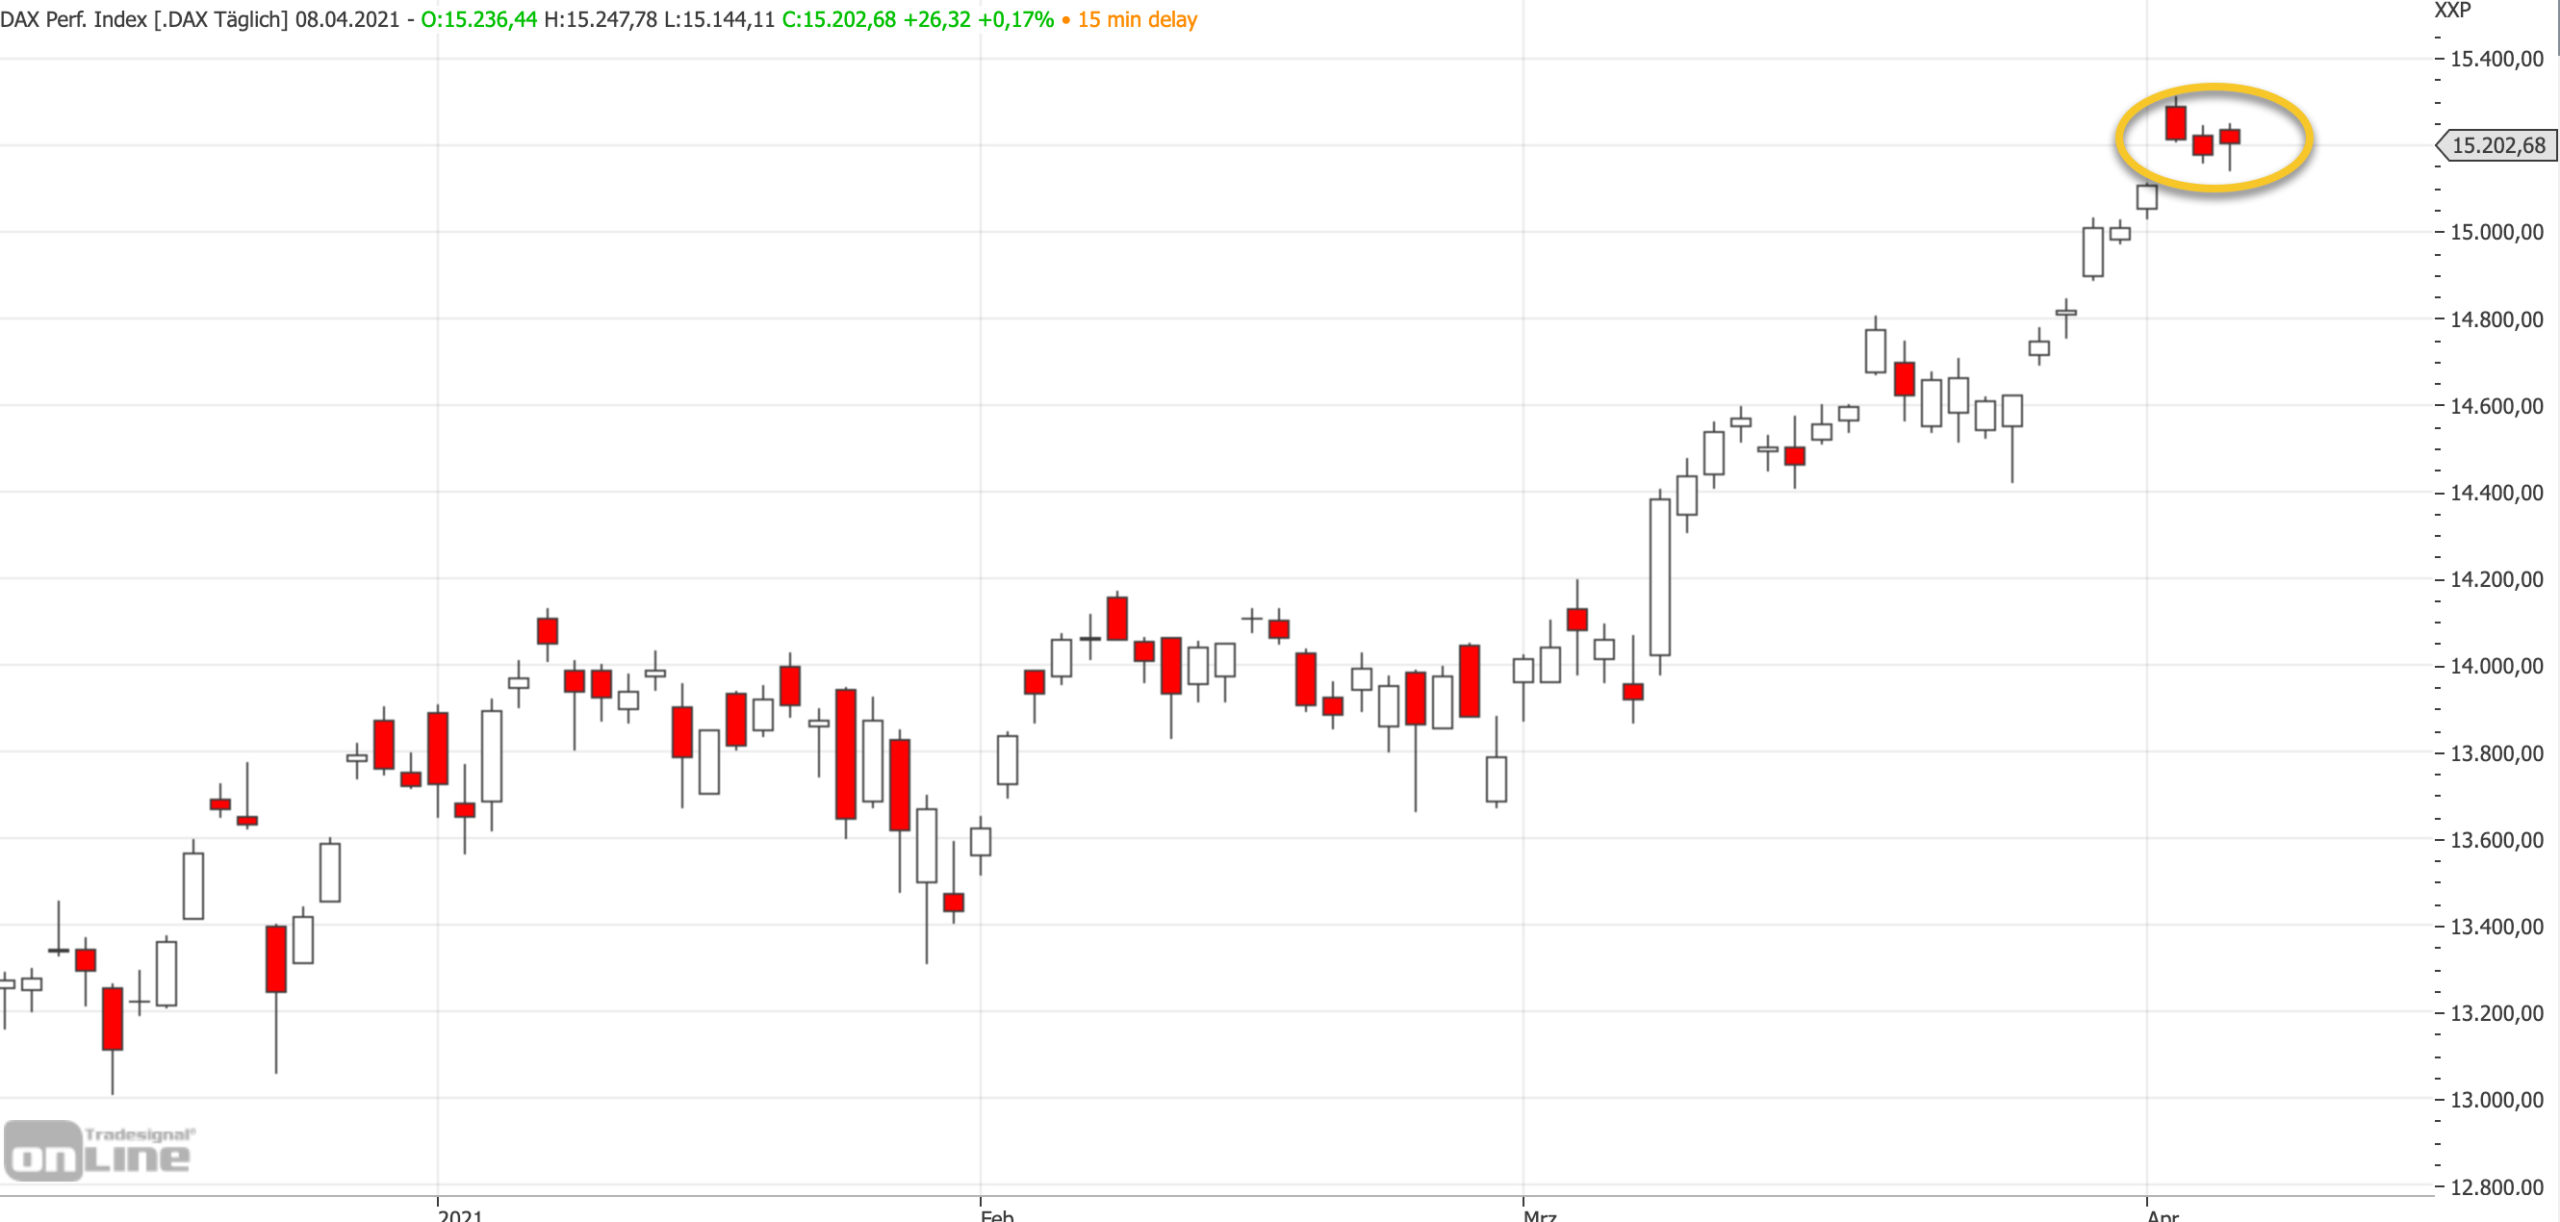 Mittelfristiger DAX-Chart am 08.04.2021